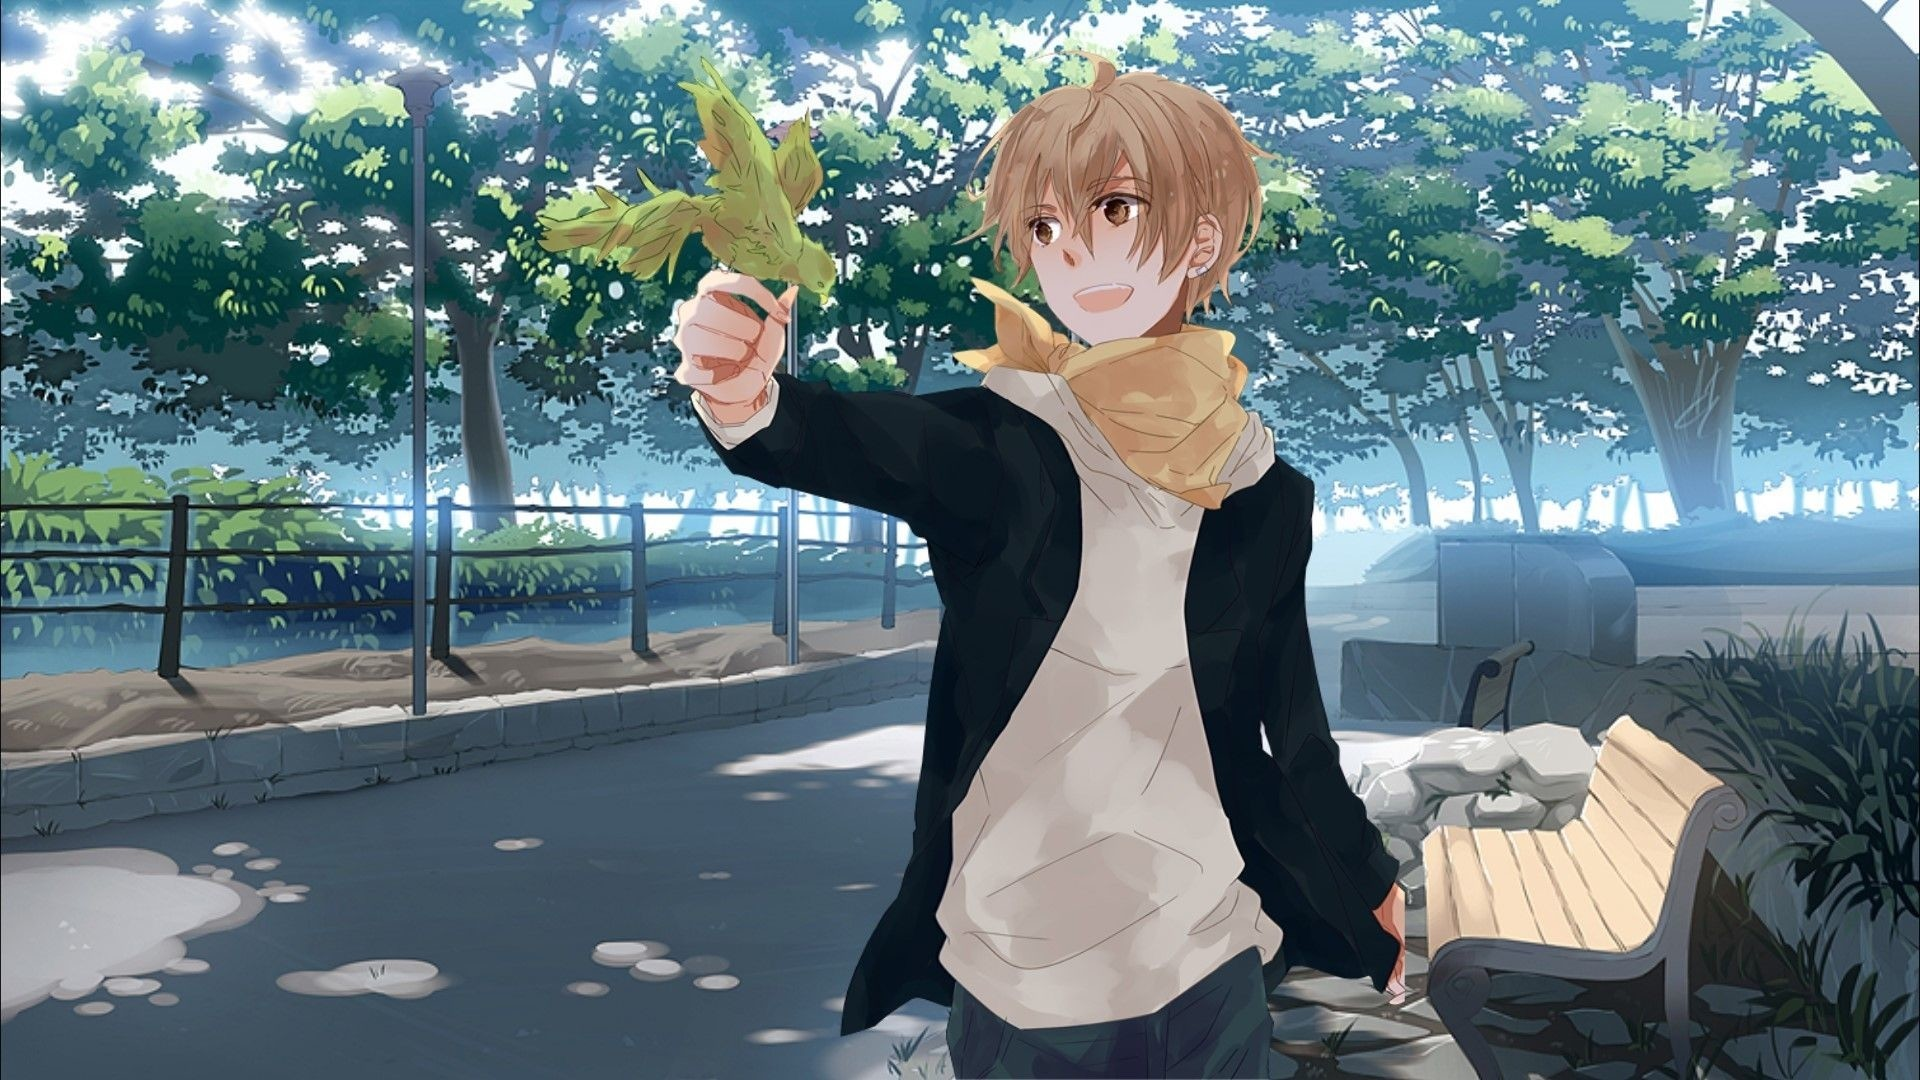 Handsome Anime Boy a wallpaper